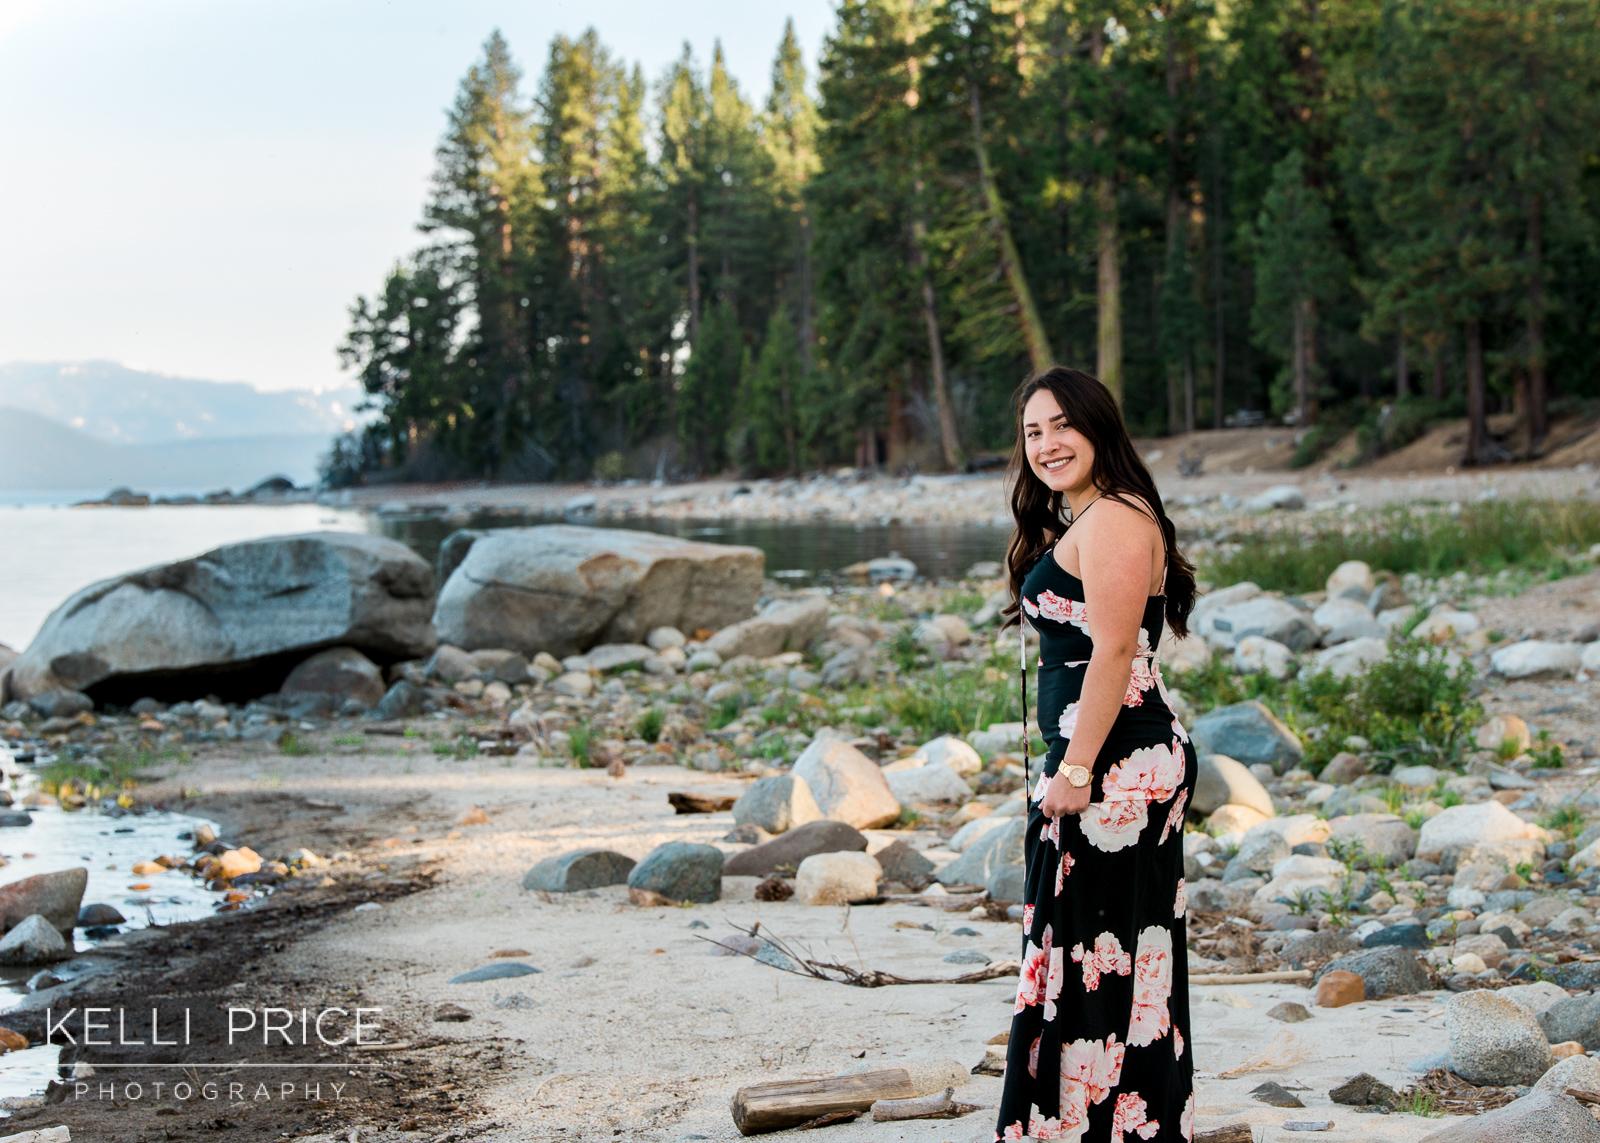 JaureguiSenior15_KelliPricePhotography_LakeTahoeCaliforniaMay2016.jpg